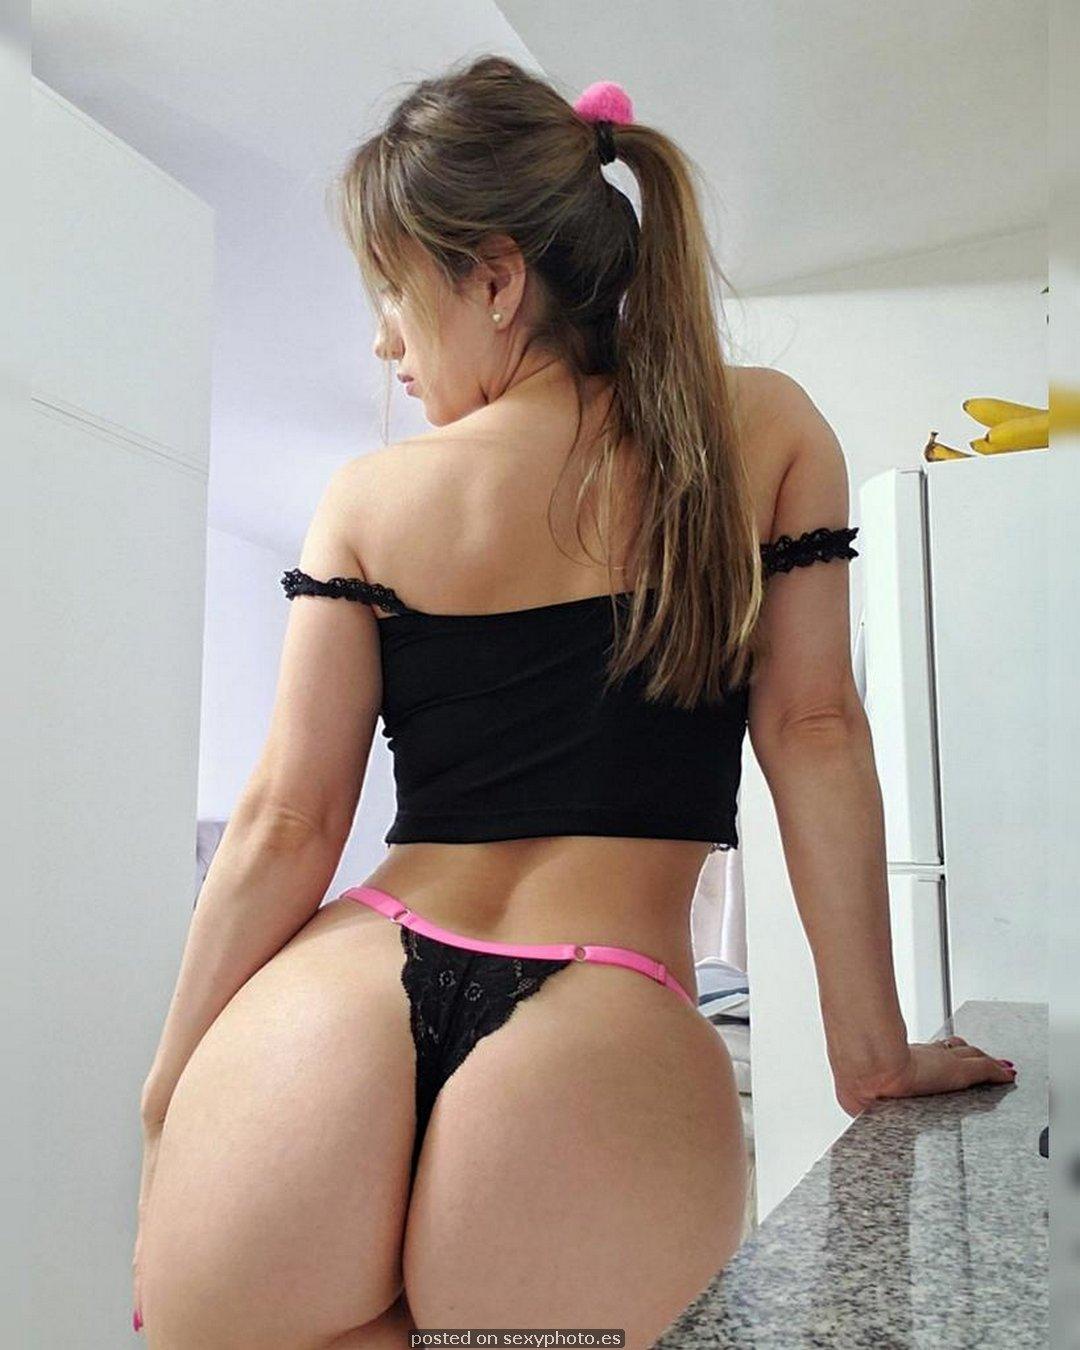 Victoria Vazquez model, Victoria Vazquez busty ass, Victoria Vazquez influencer hot sexy